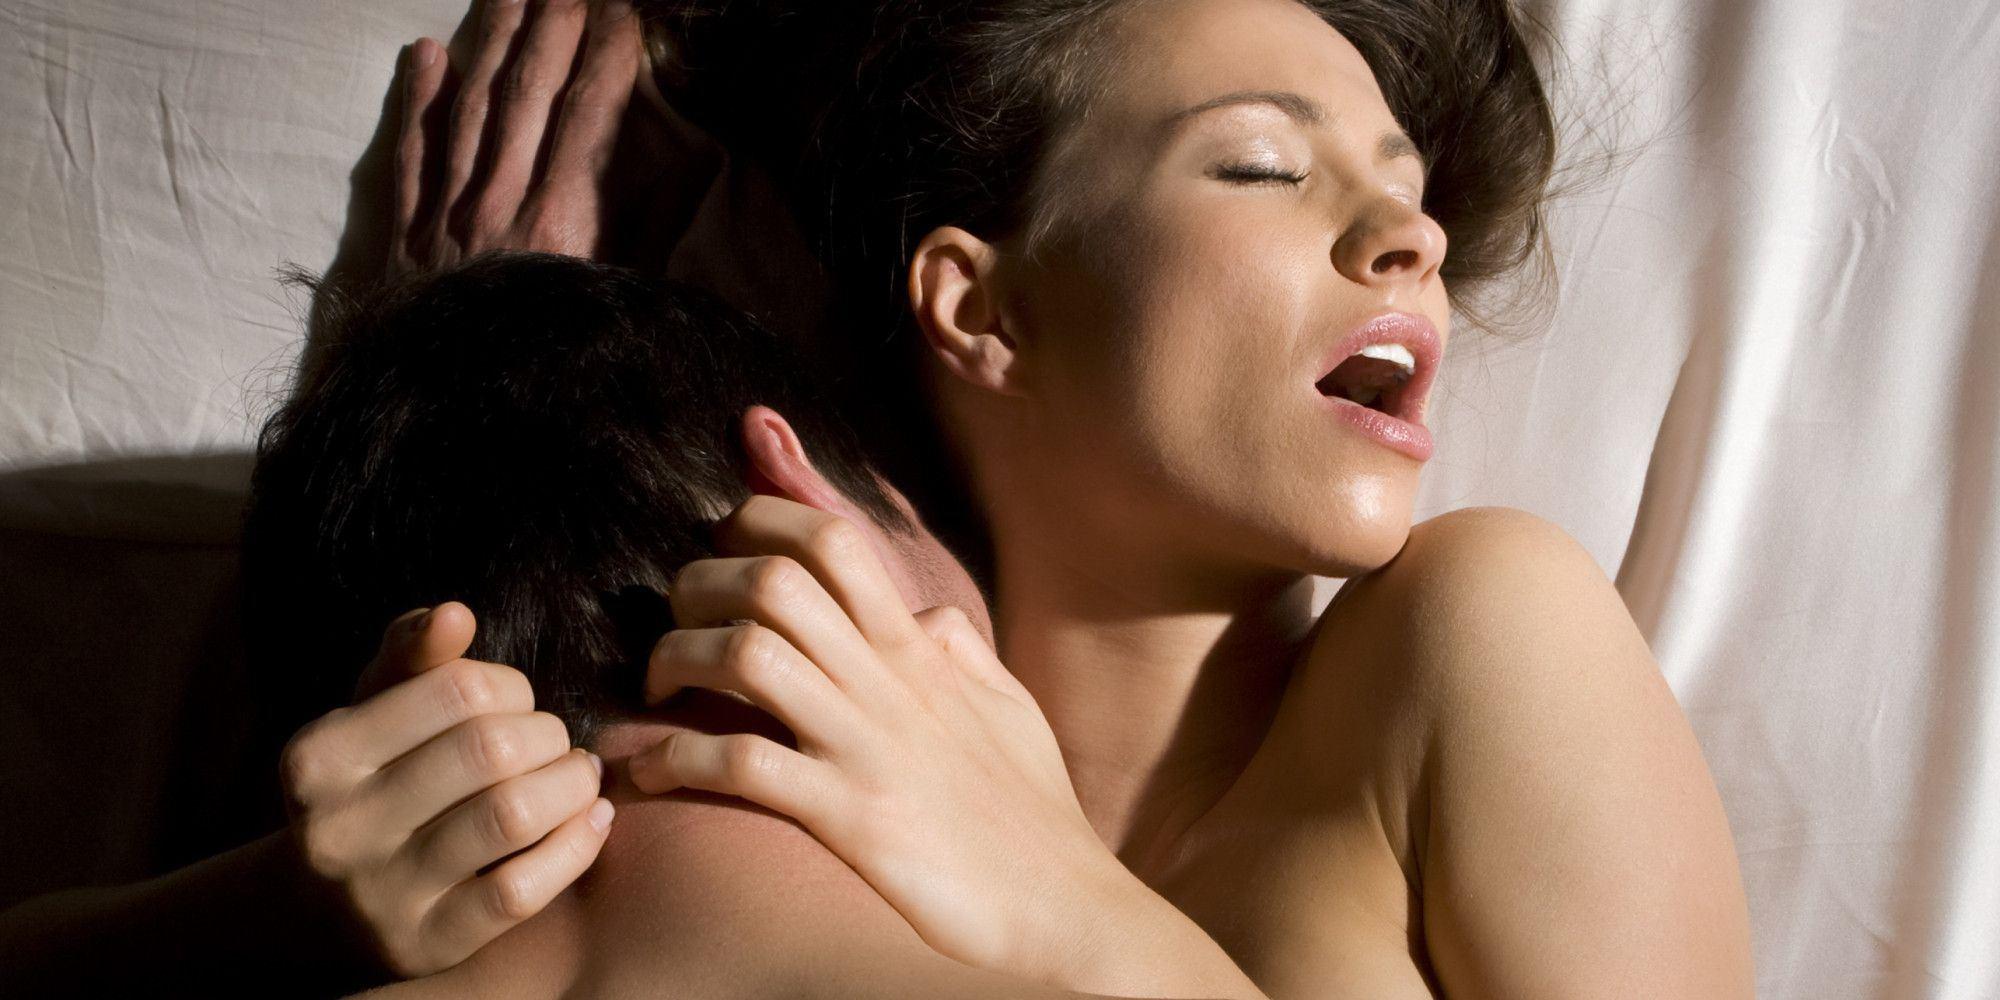 Paloma reccomend Long time to orgasm women